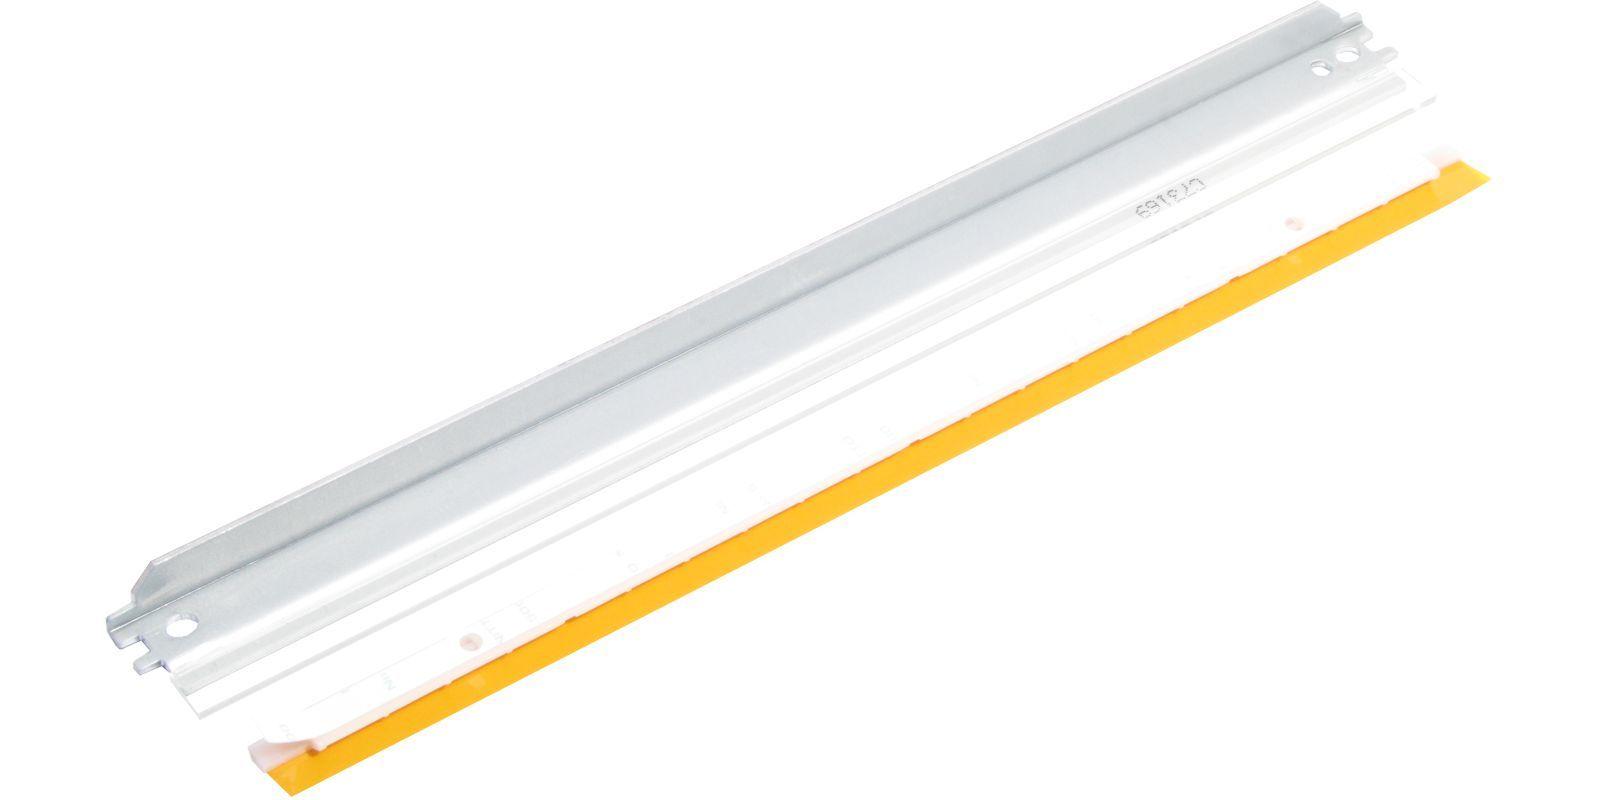 Ракель Static Control© WB CM4540 (HP4525BLADE-10) Wiper Blade - чистящее лезвие.